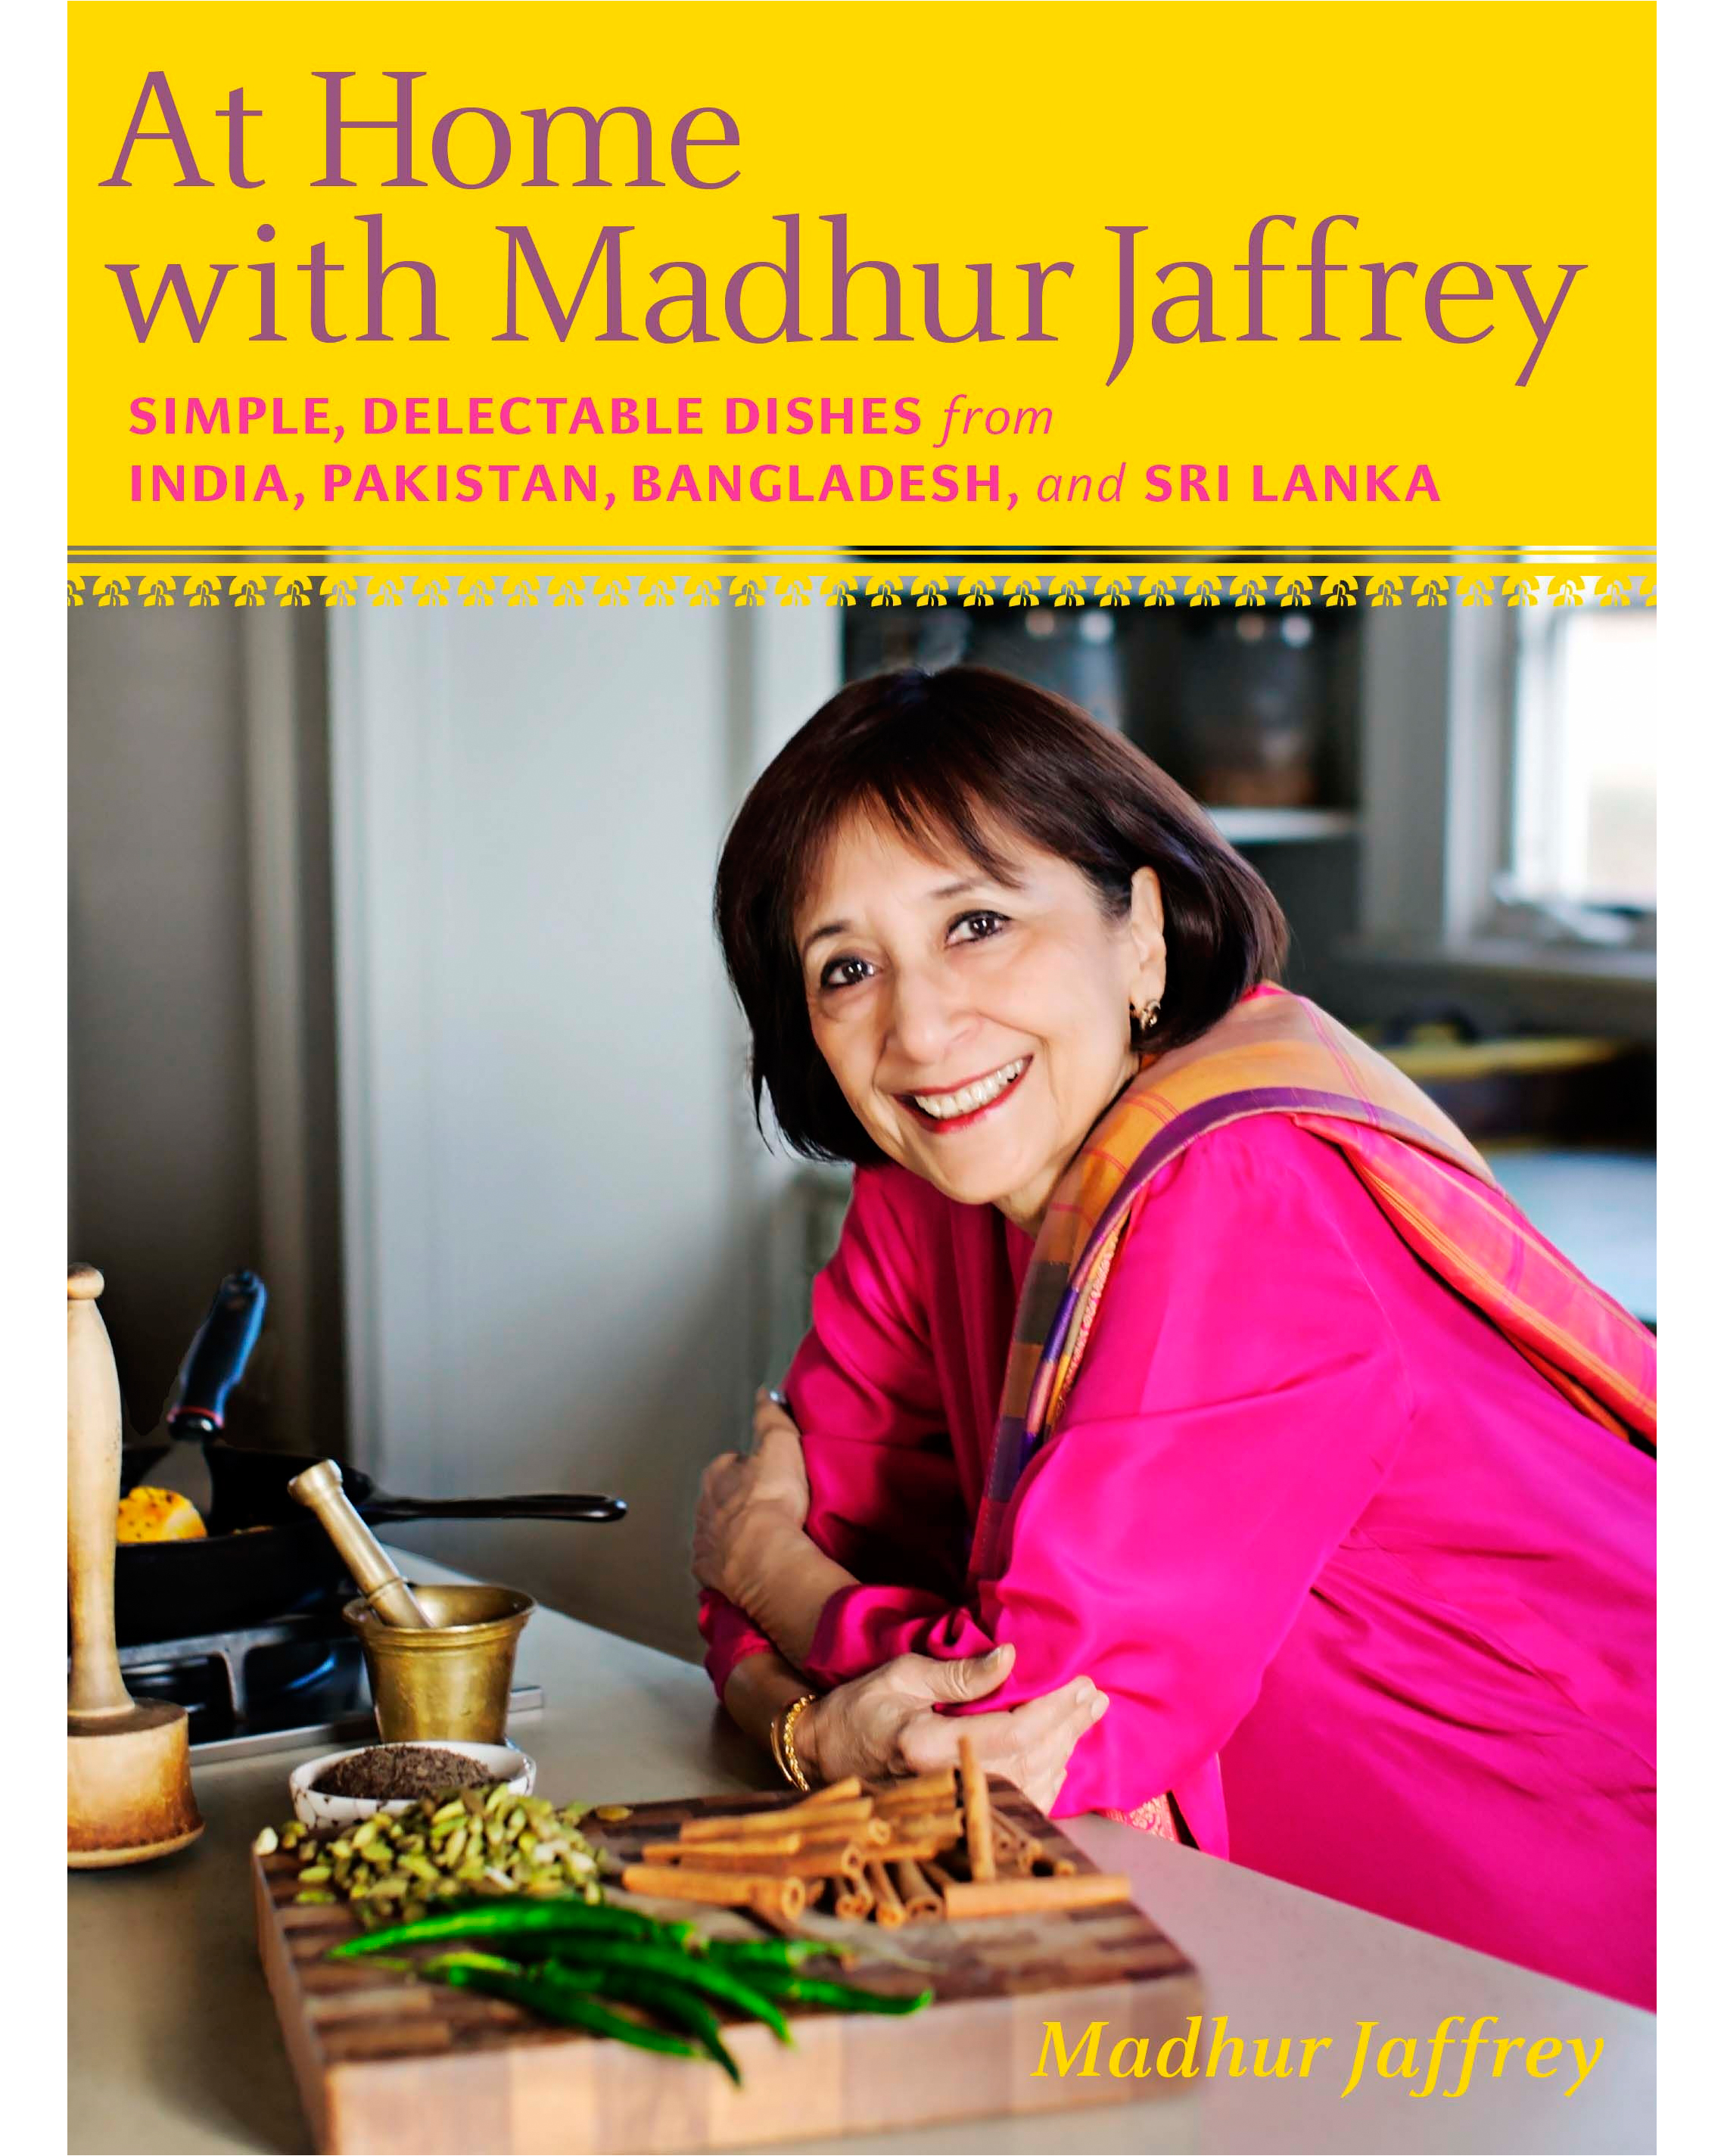 newlywed-cookbooks-at-home-madhur-jaffrey-1015.jpg